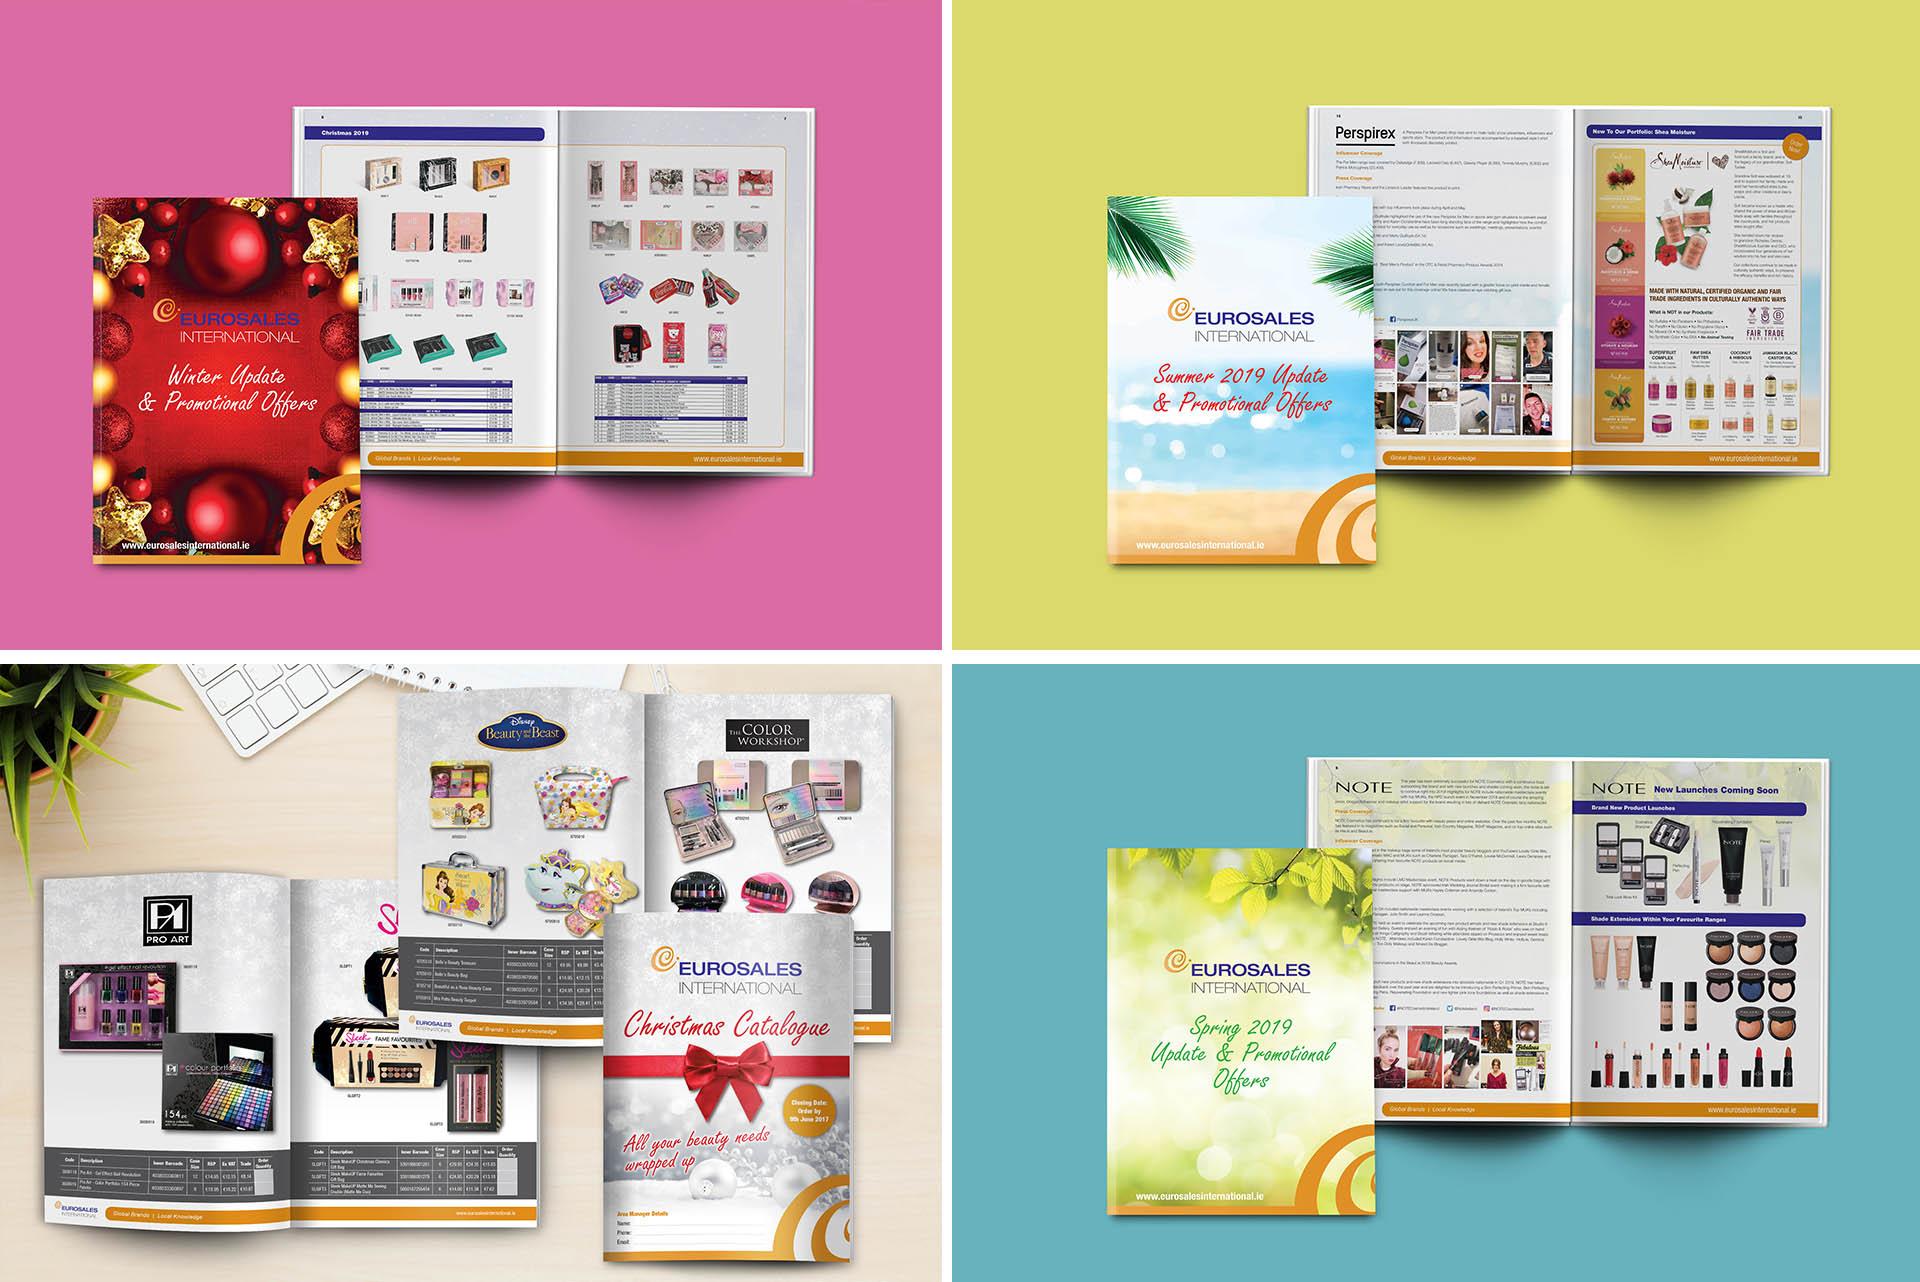 Eurosales Quarterly Product Brochures